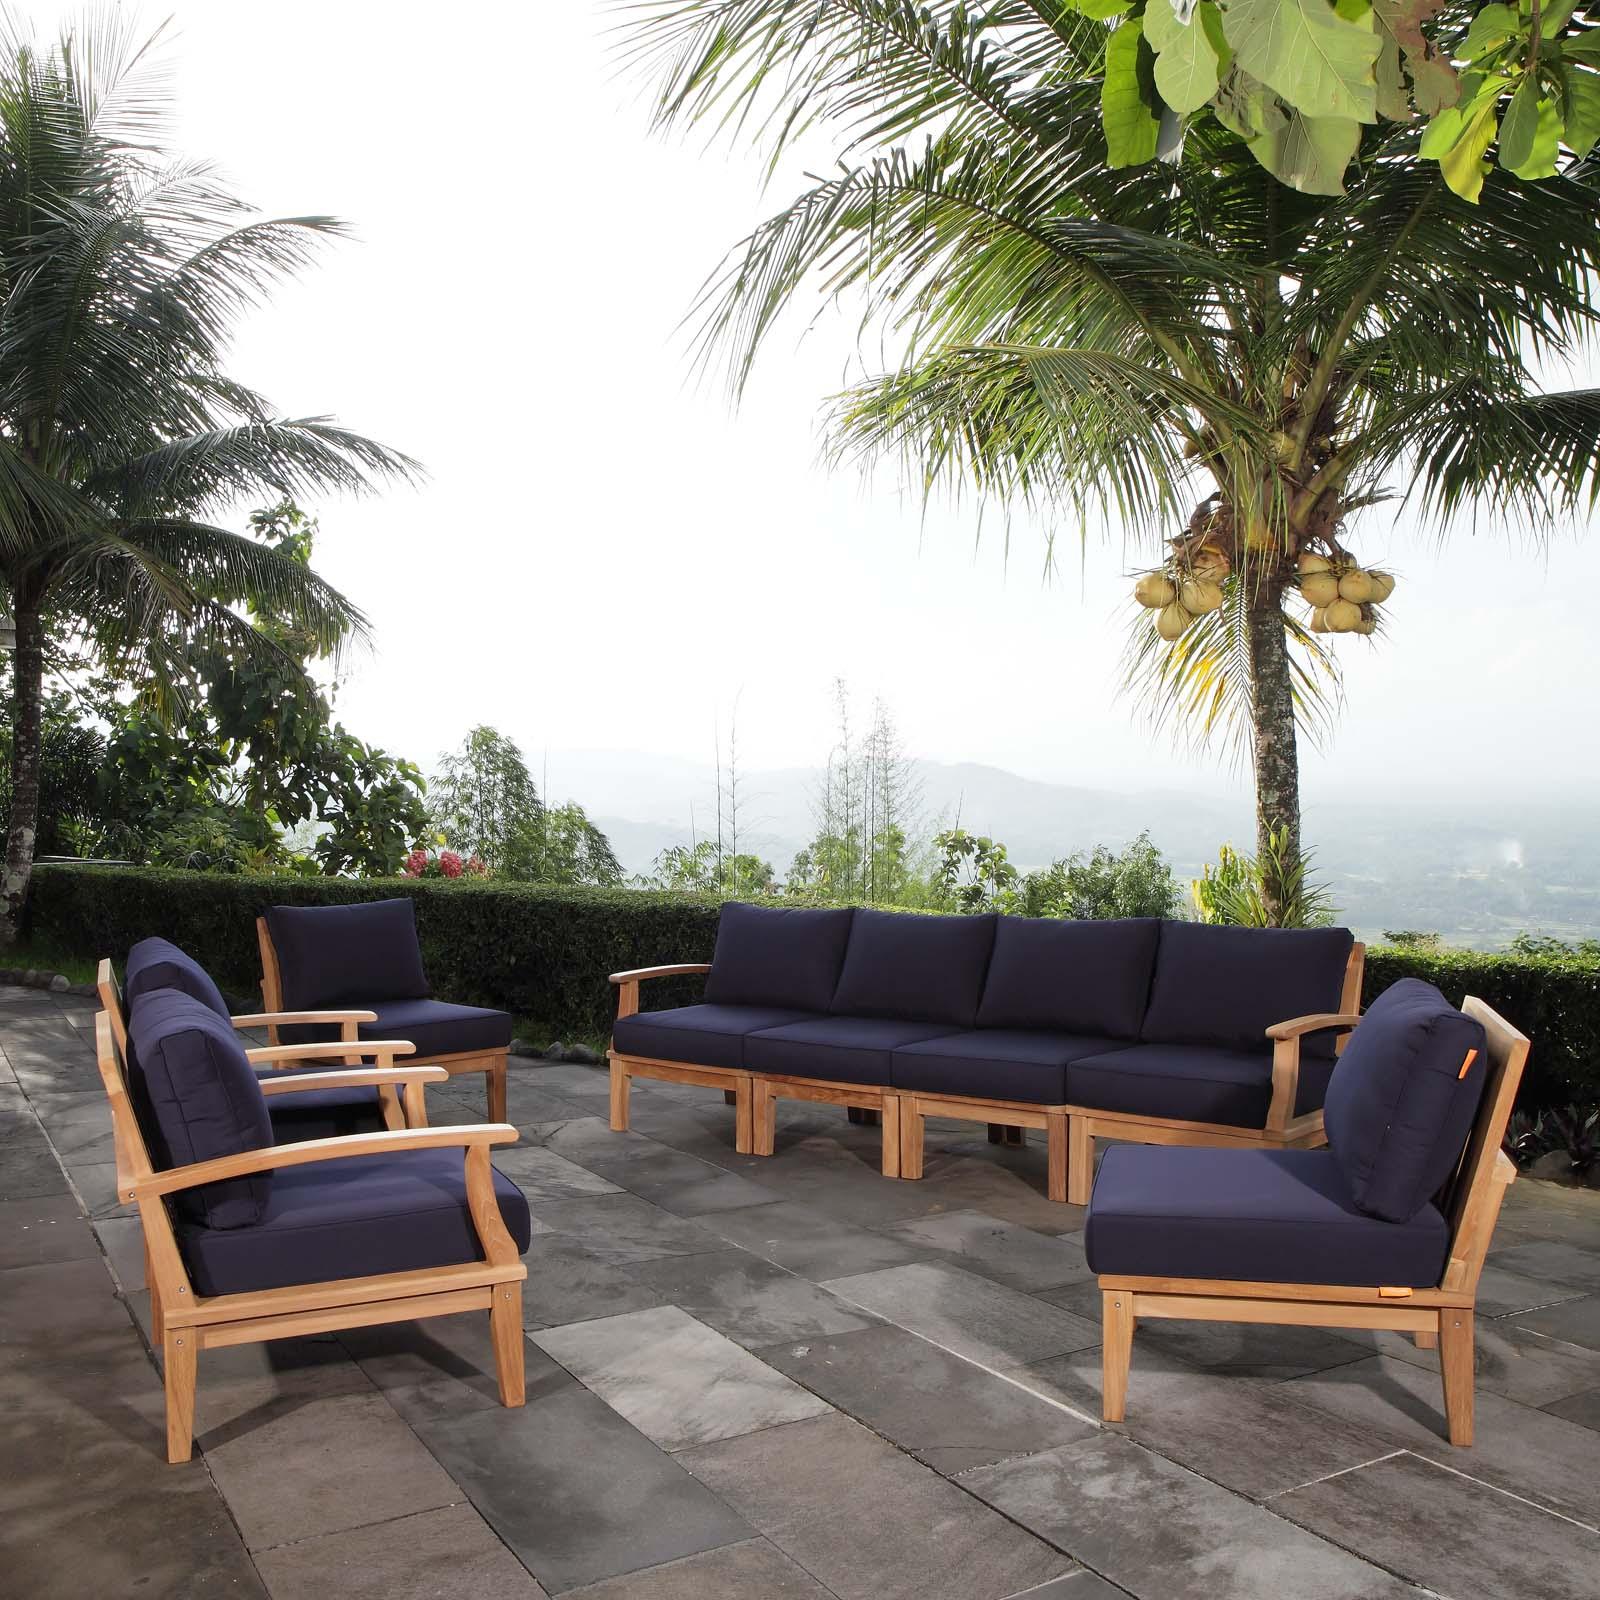 6 piece patio teak sectional outdoor teak set teak wood set teak patio set